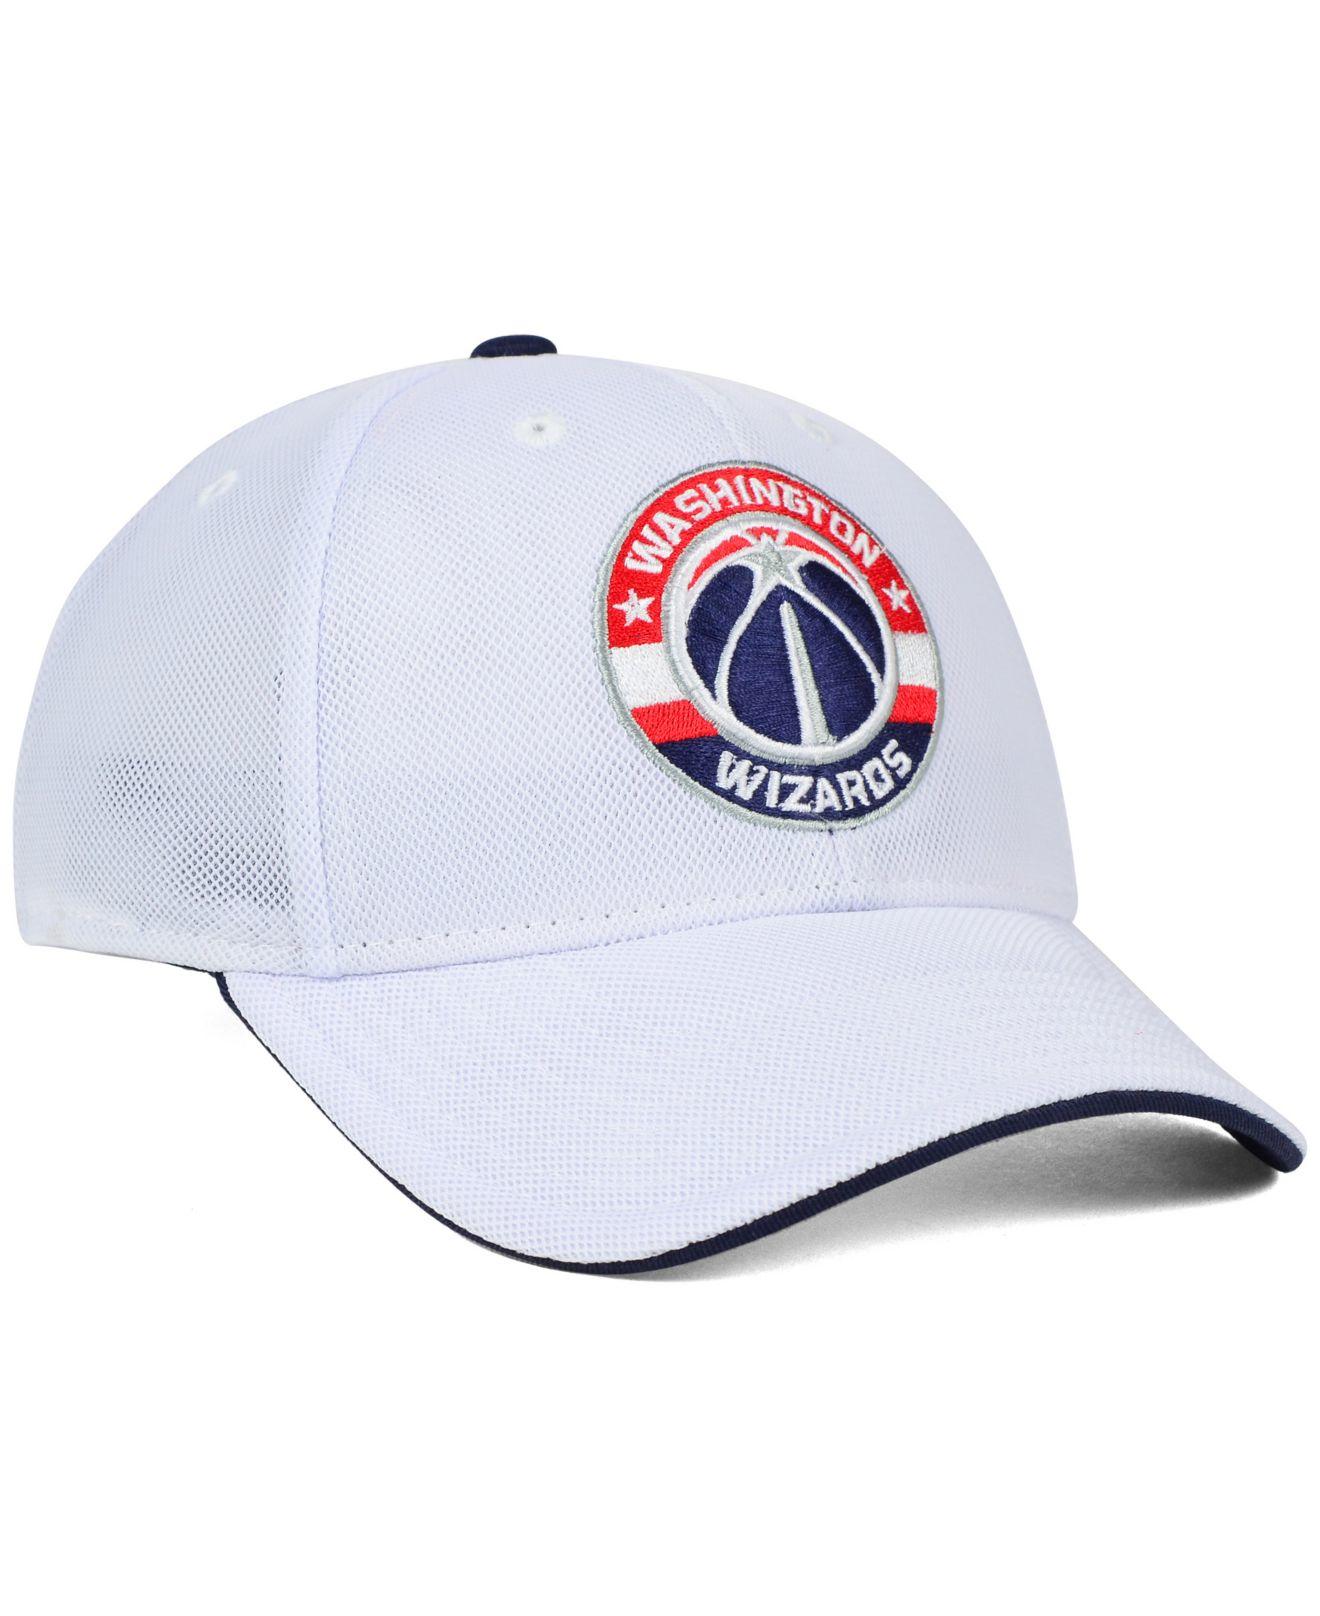 watch 56734 cd580 Lyst - adidas Washington Wizards Authentic Flex Cap in Black for Men